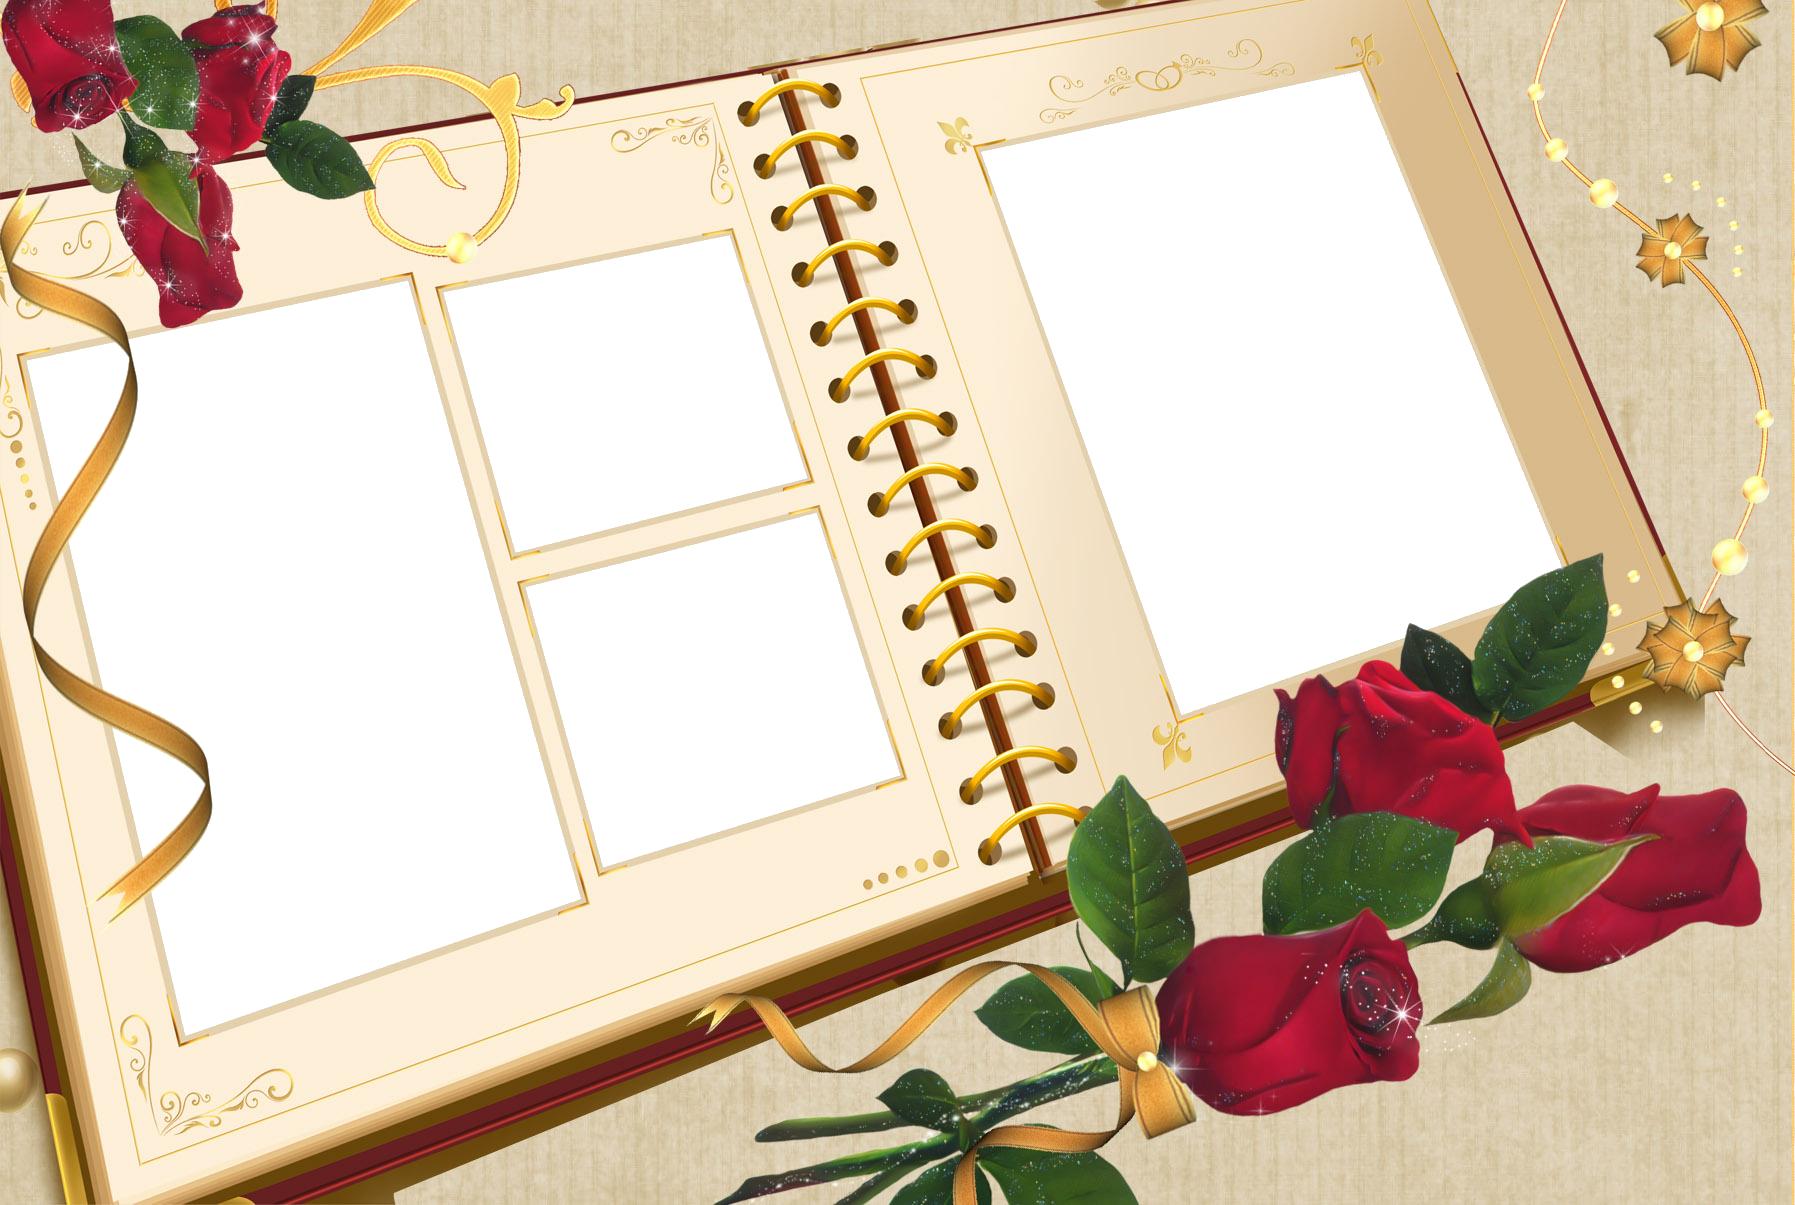 Large Transparent Album Frame with Roses.